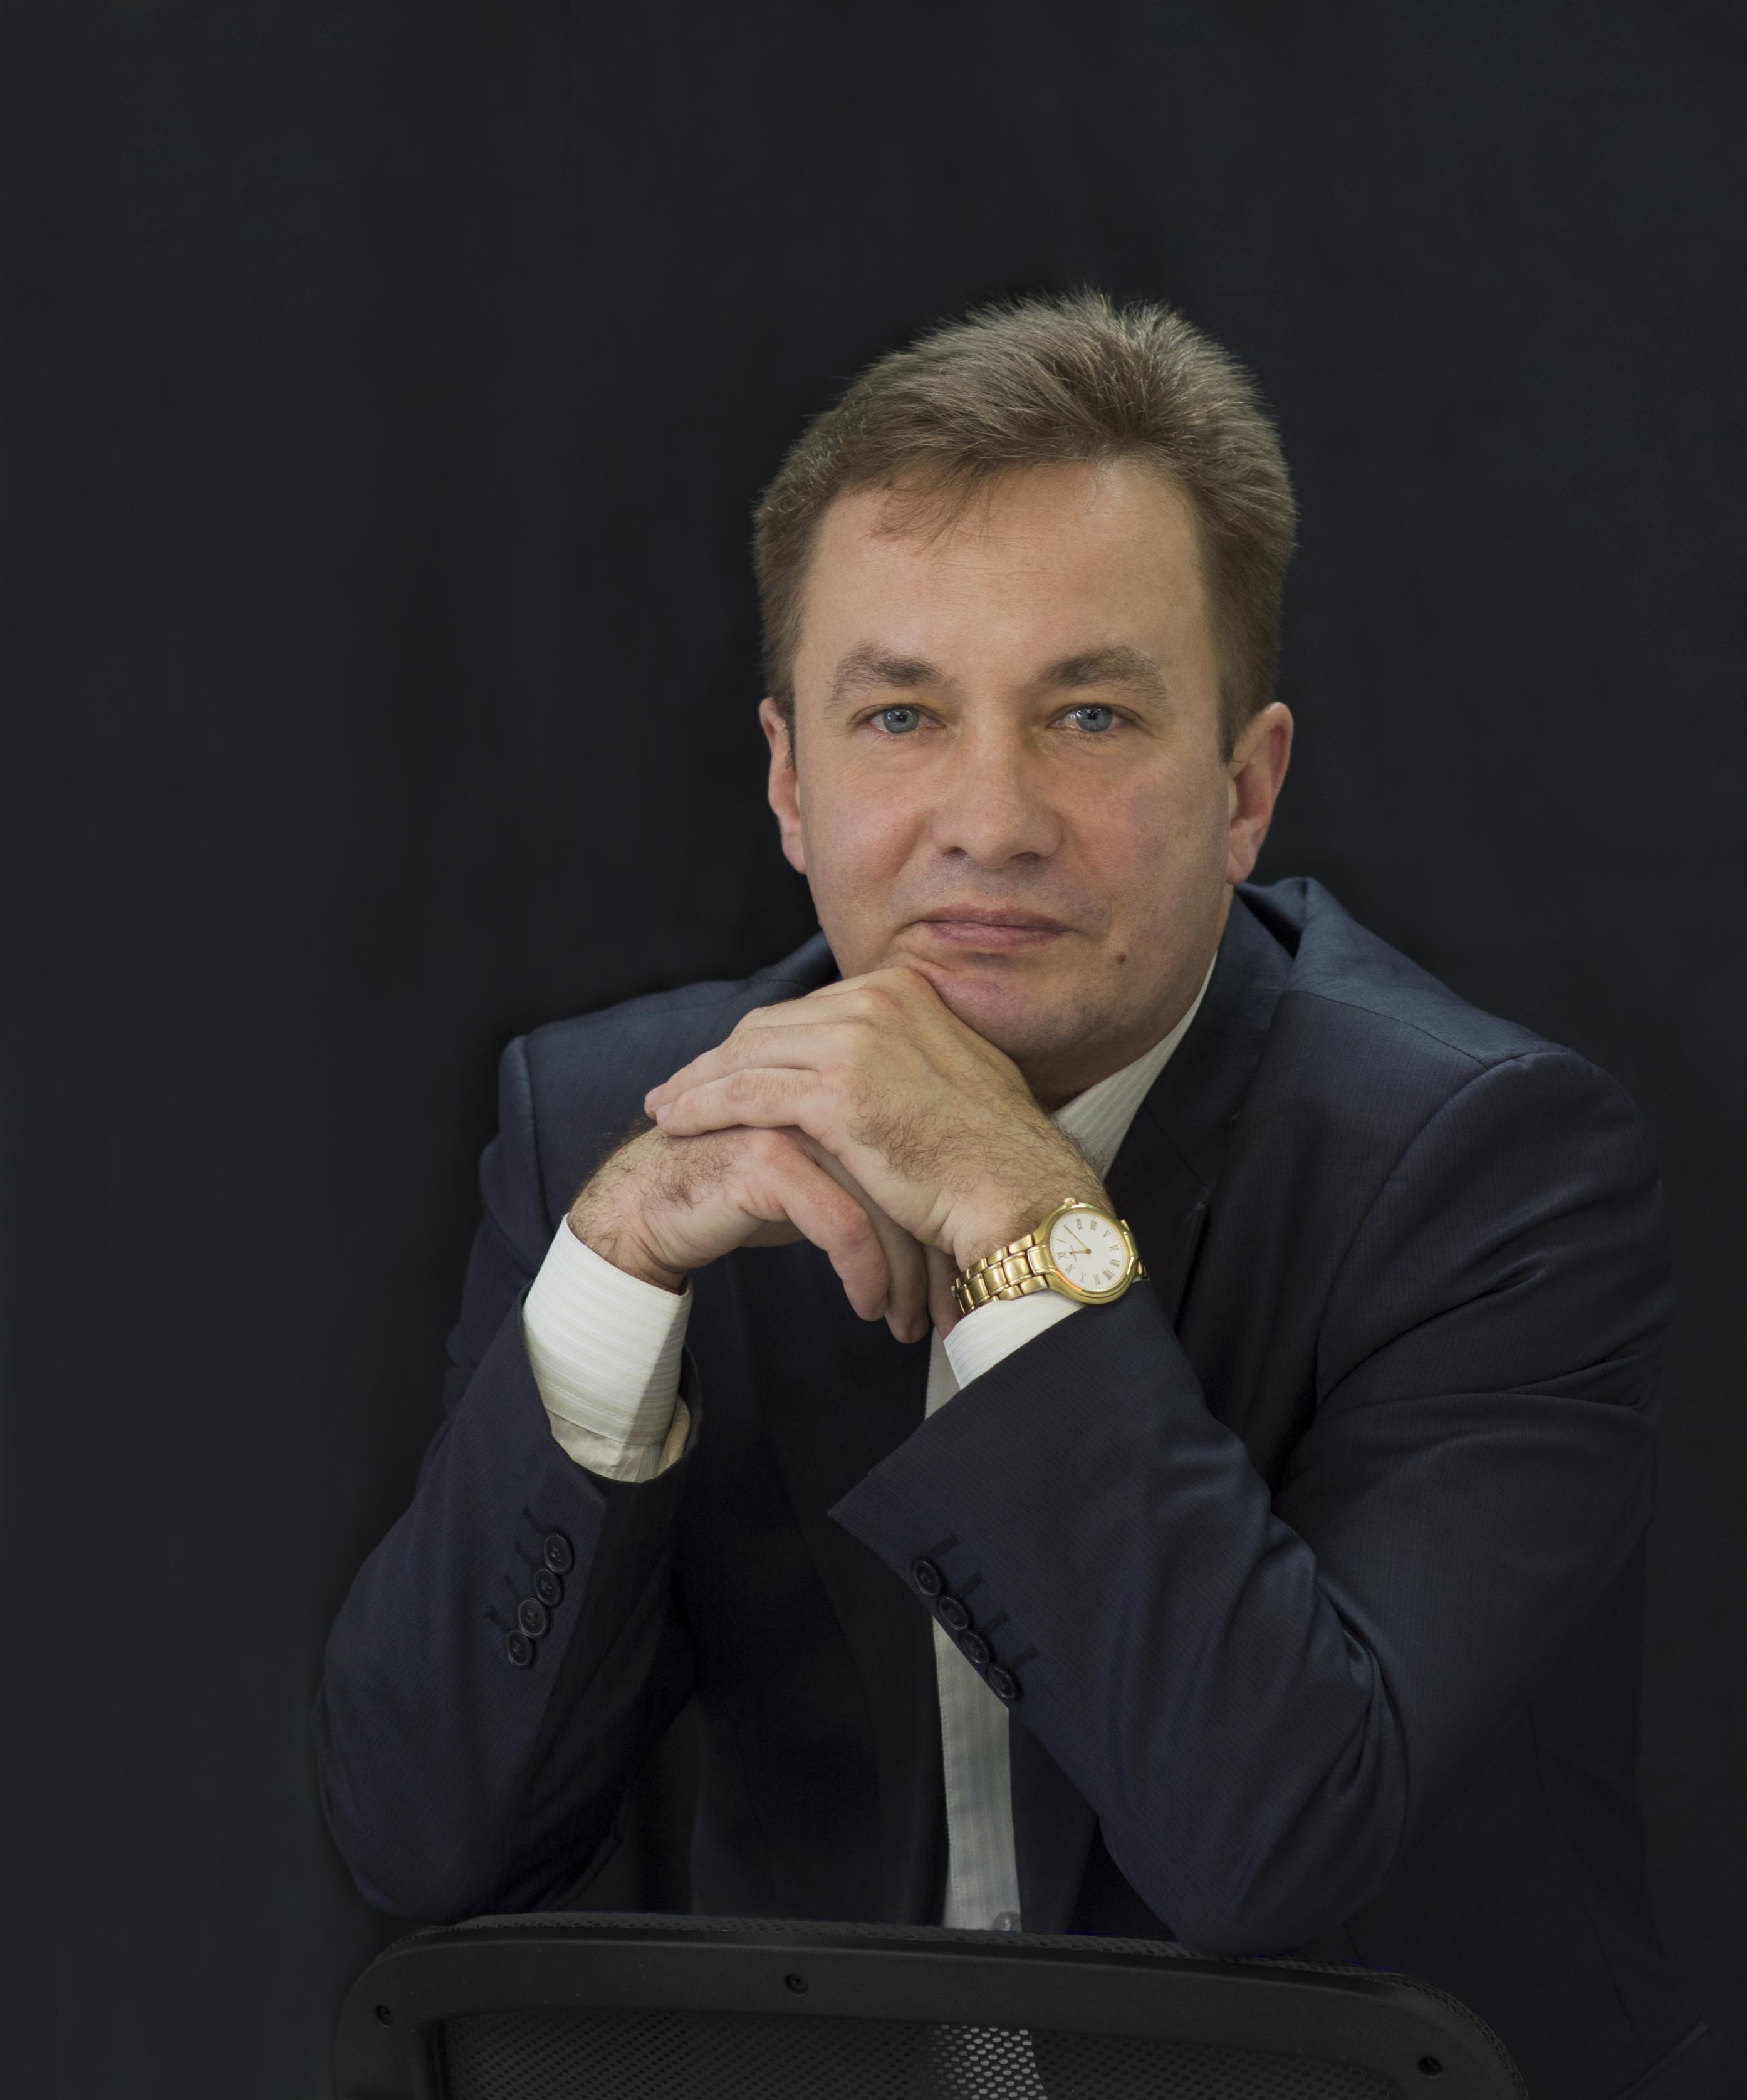 Ярославцев Александр Team Leader